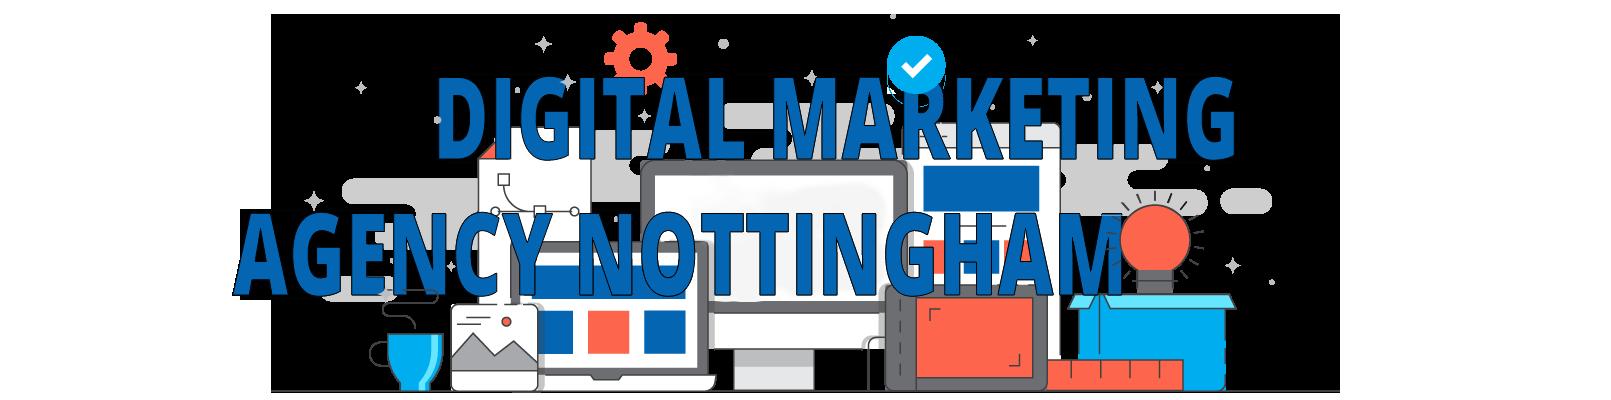 seek social, a digital marketing agency in Nottingham